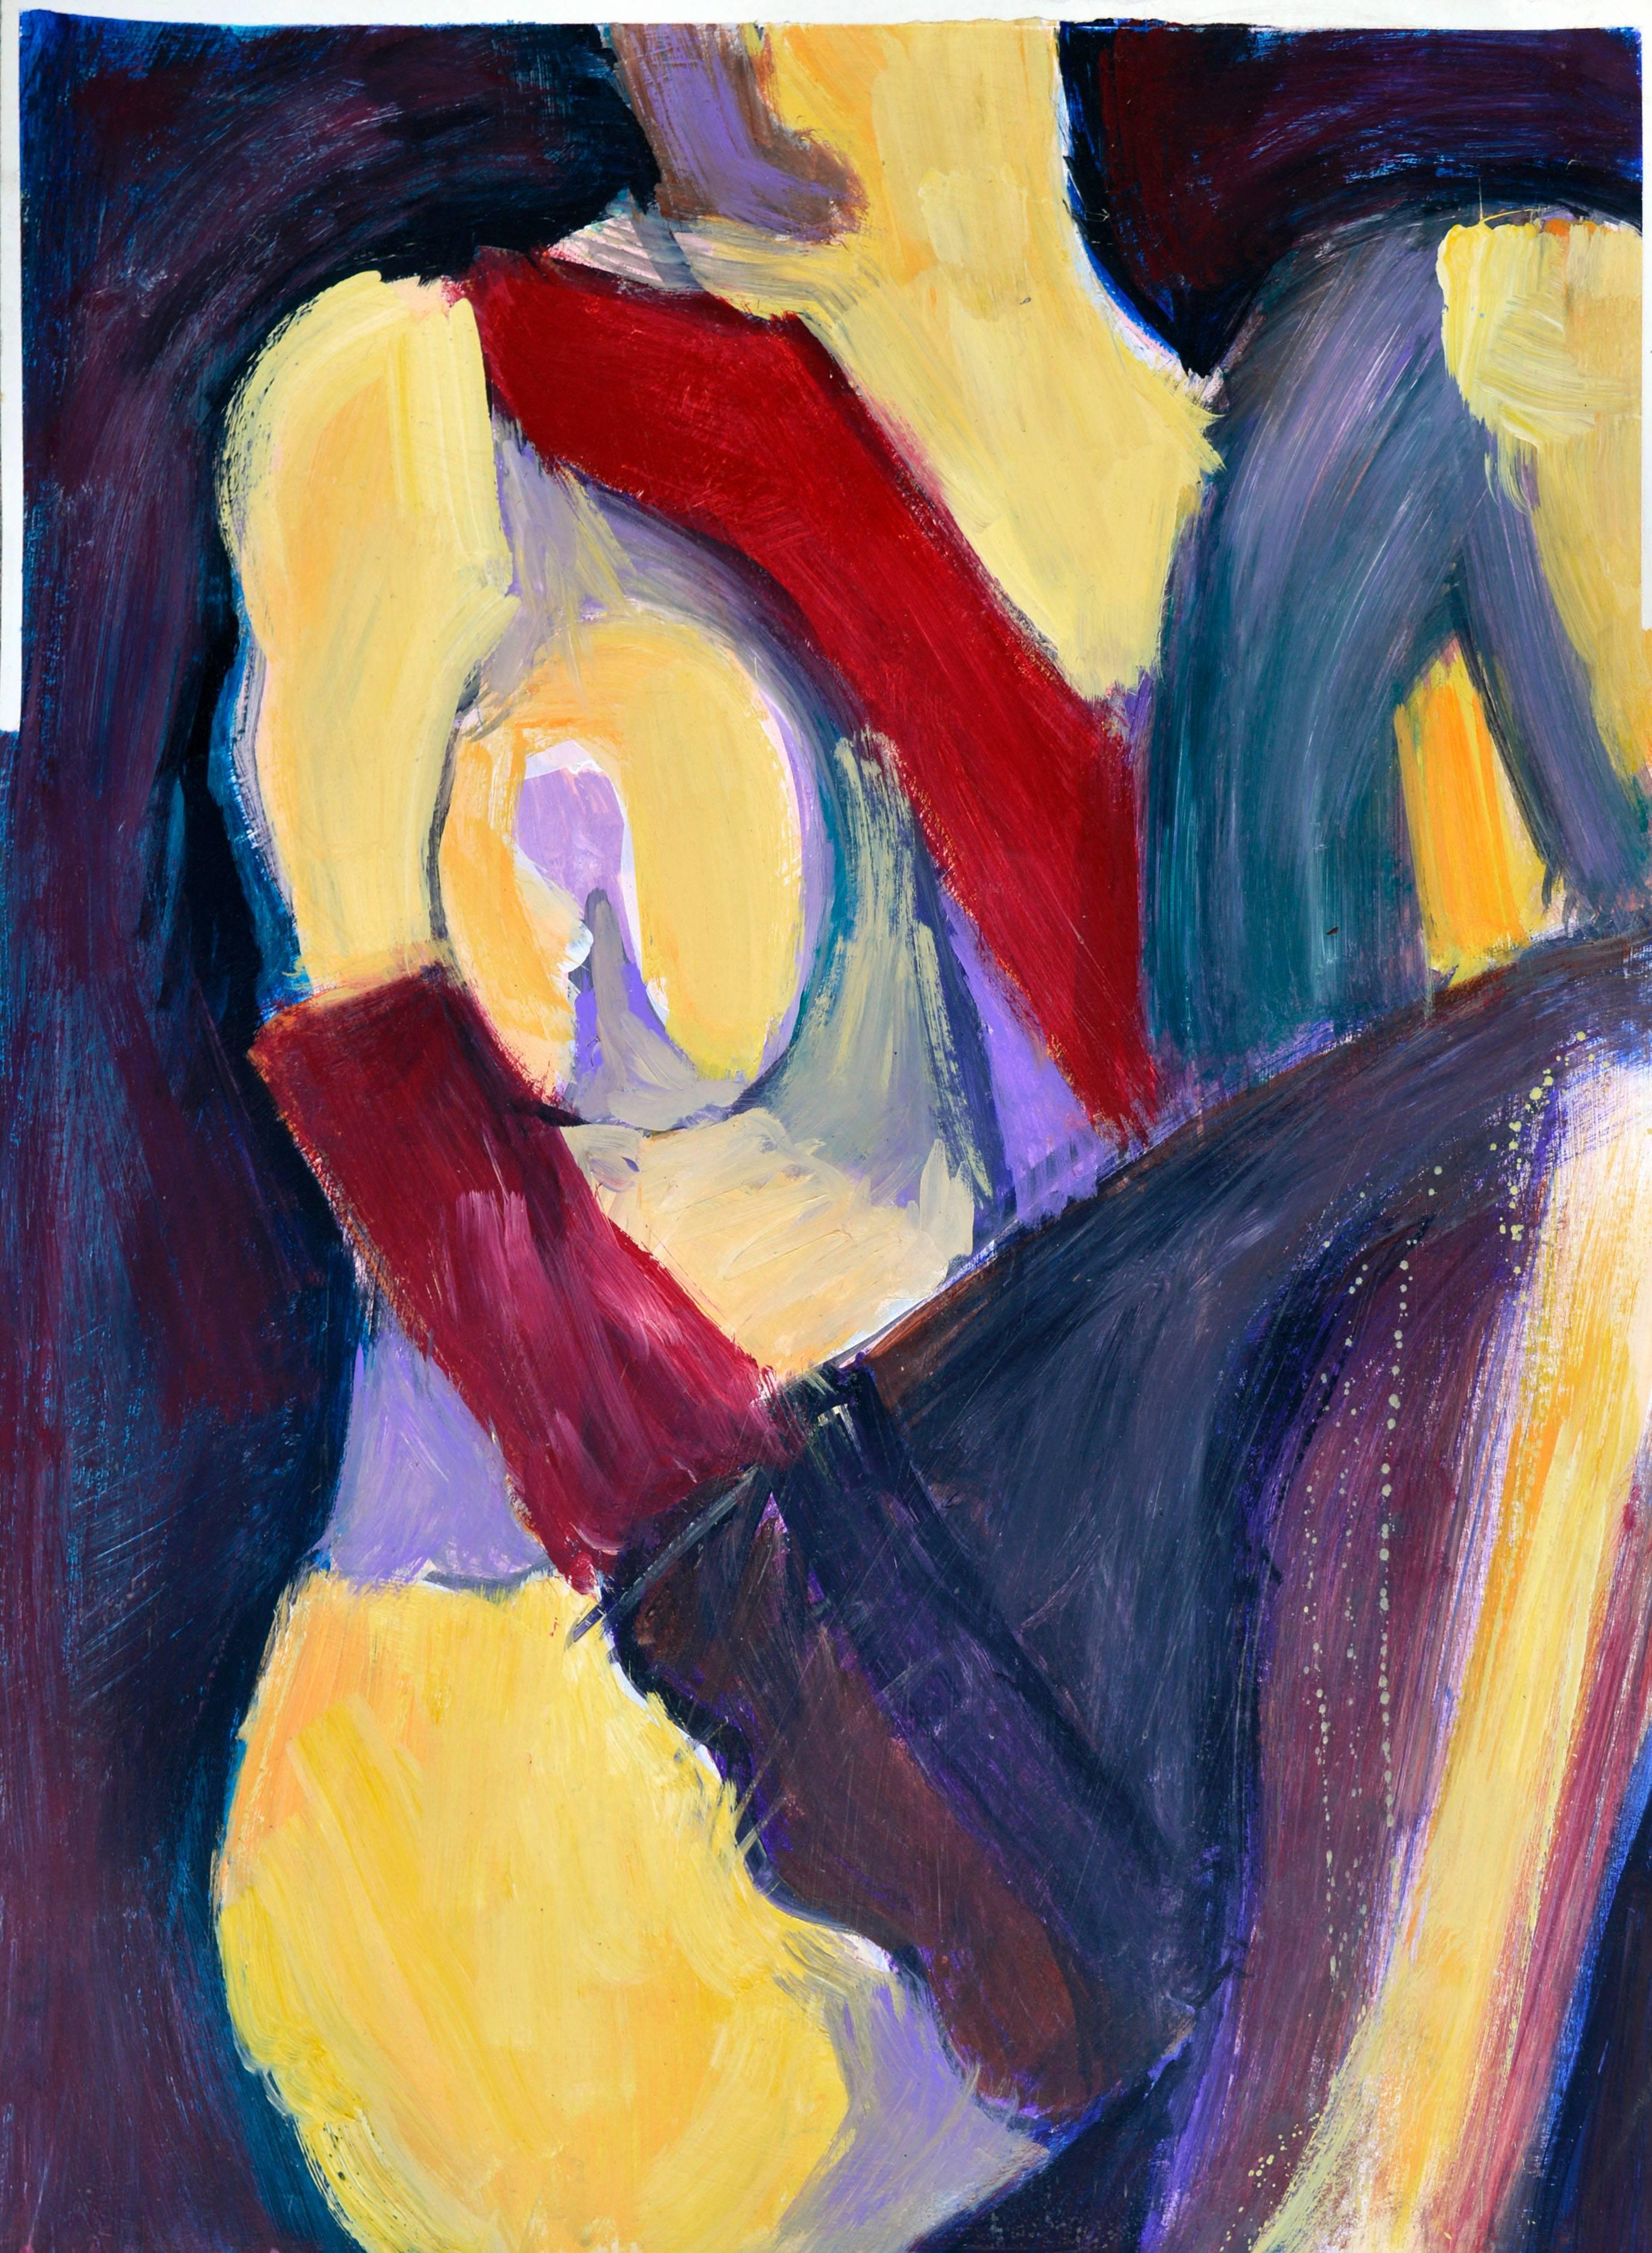 Yellow Figure in Black Stockings